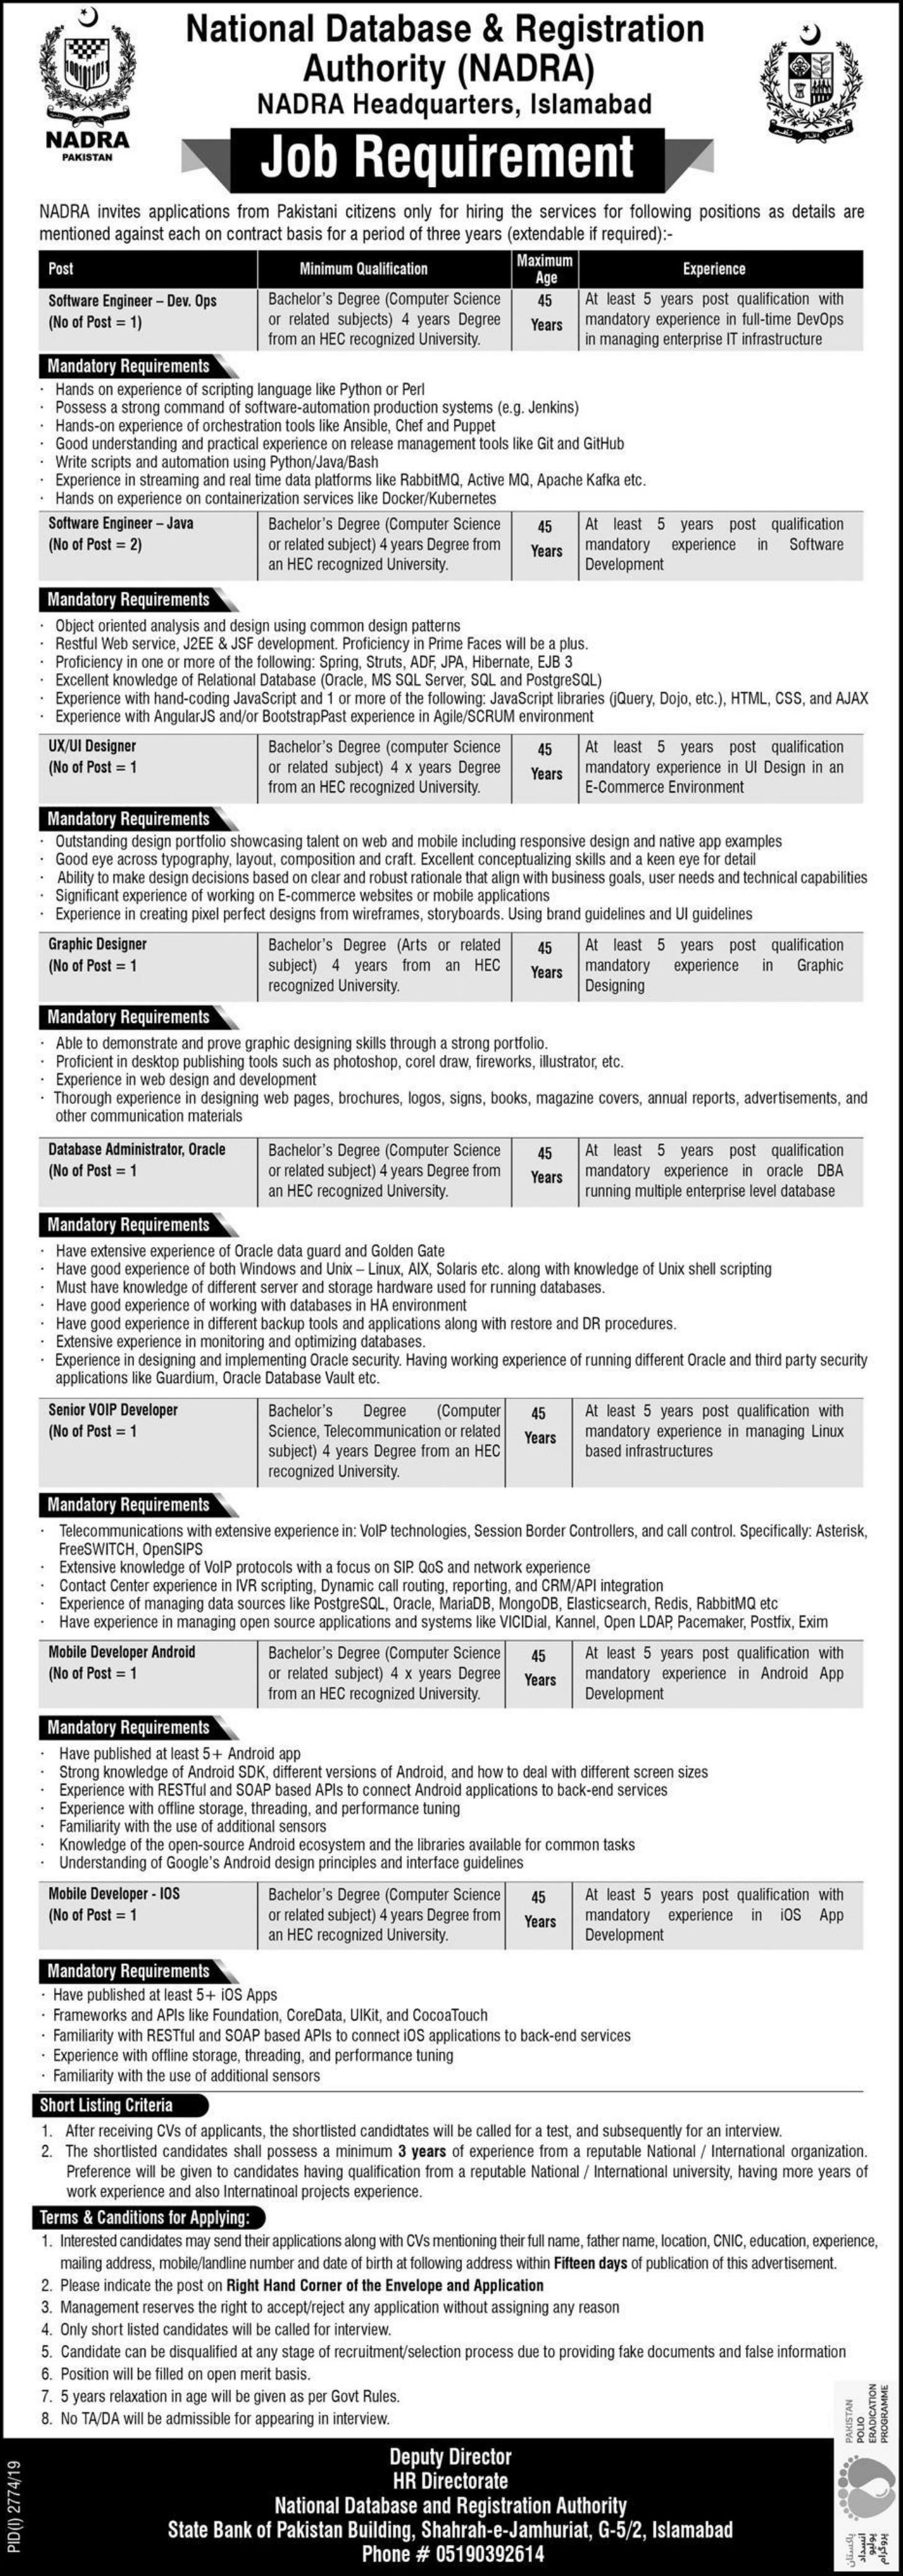 NADRA Jobs- NADRA Headquarters Islamabad Jobs 2019